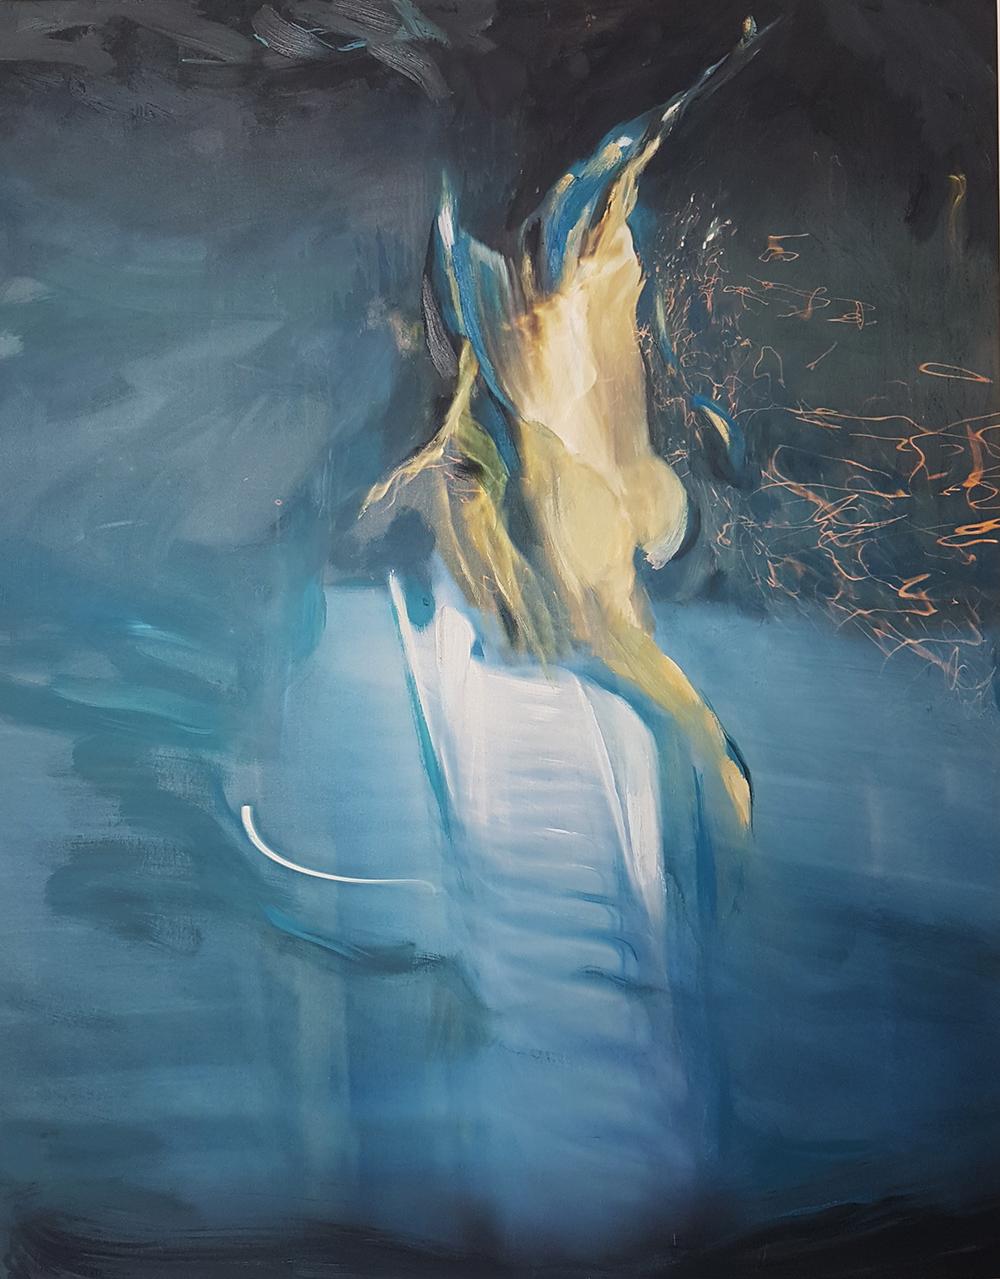 Andrew Hart Adler  Aqua Lady XVI  Mixed media and digital print on canvas  123 x 97 cm